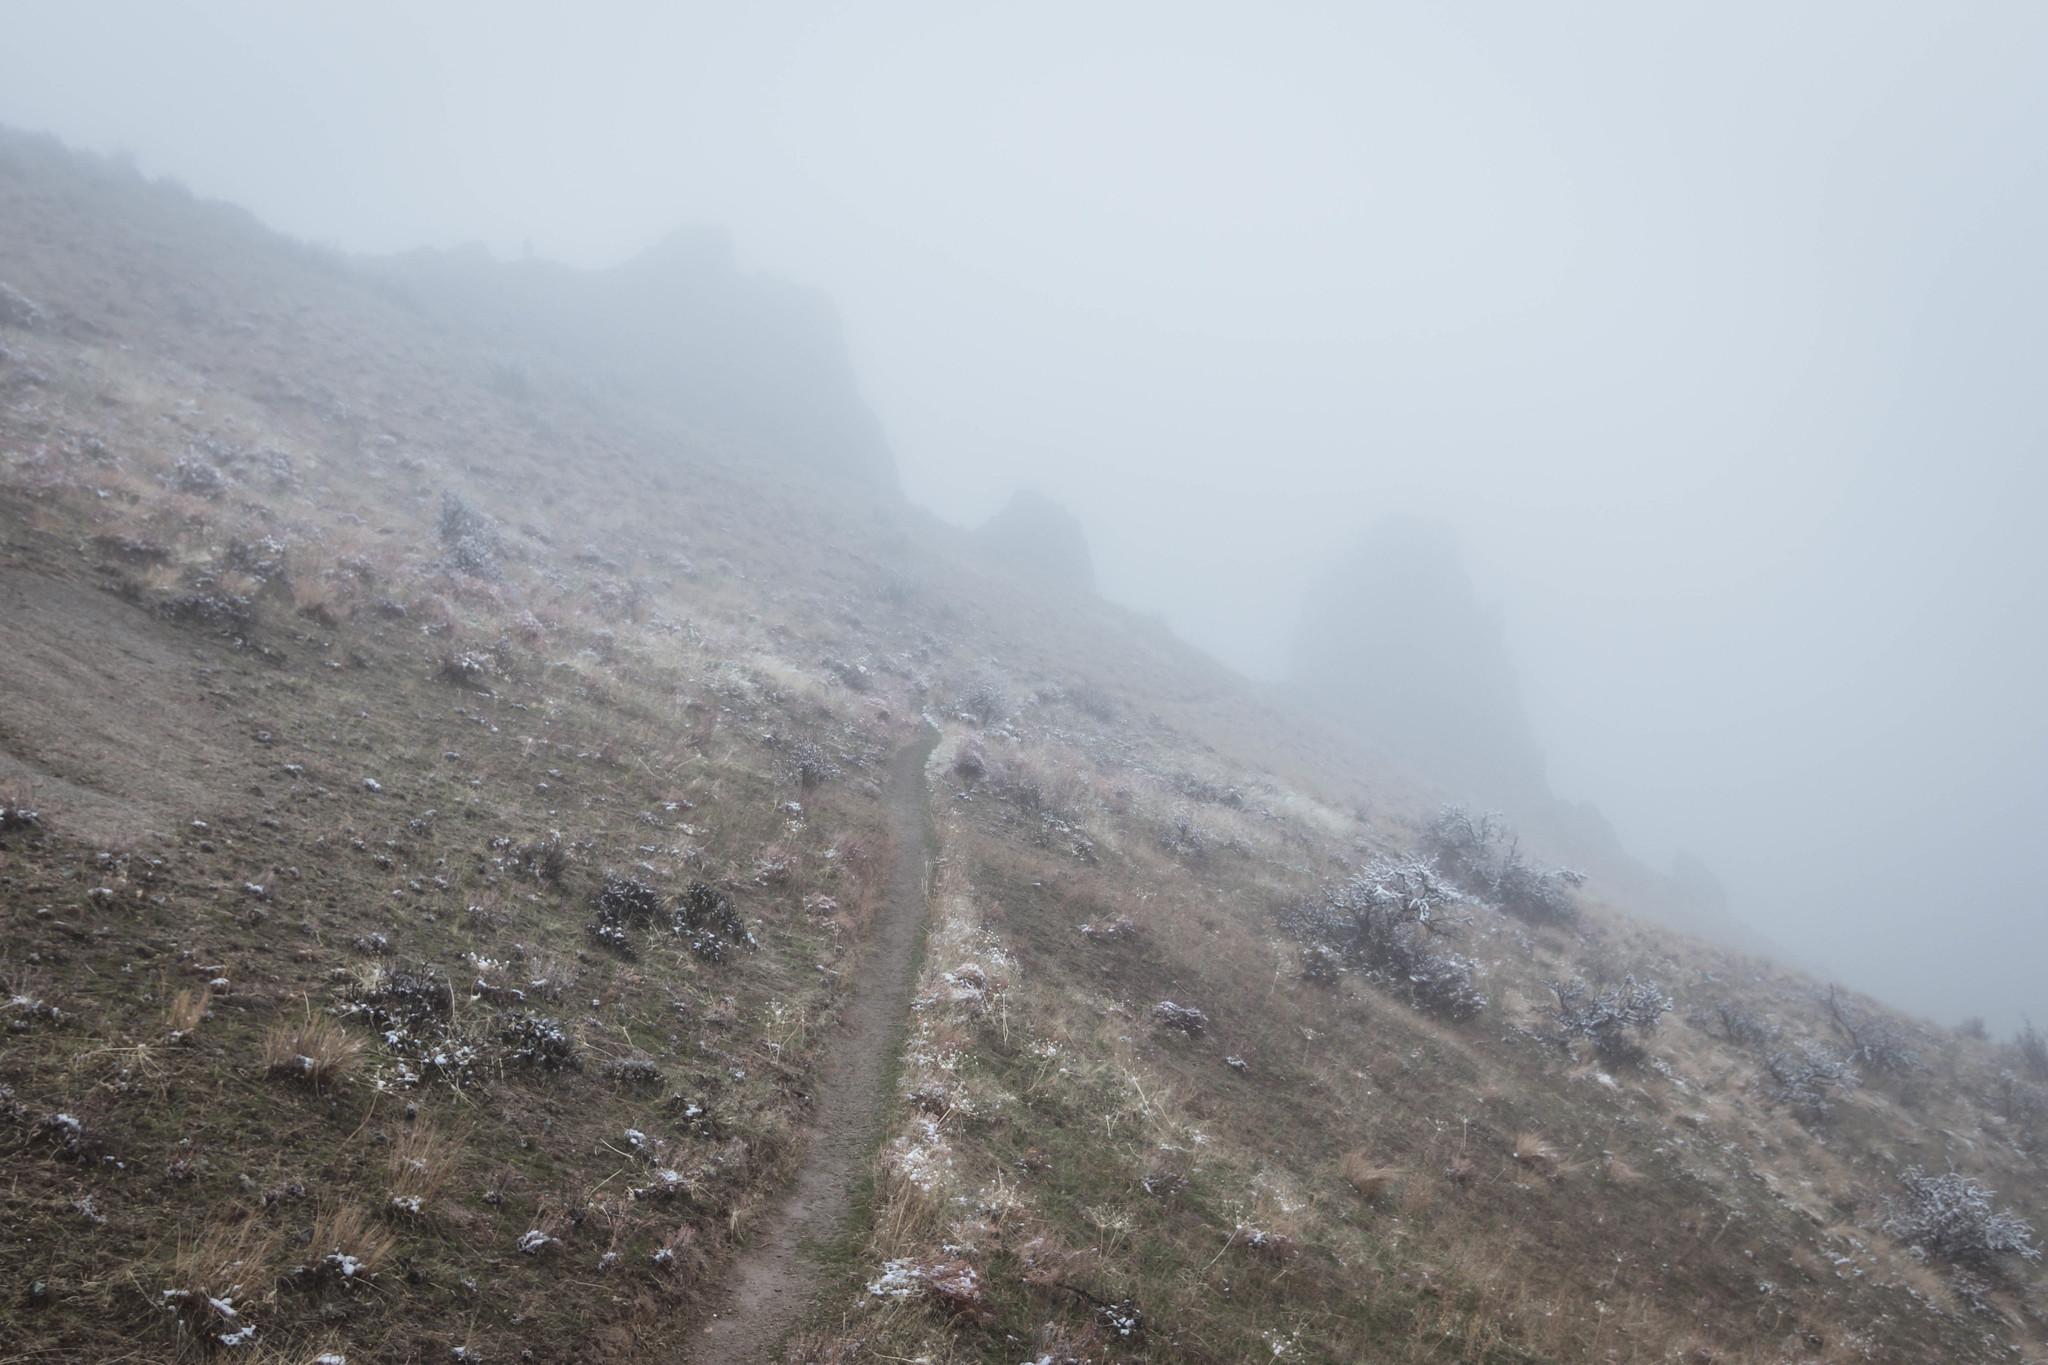 Saddle Rock in the mist